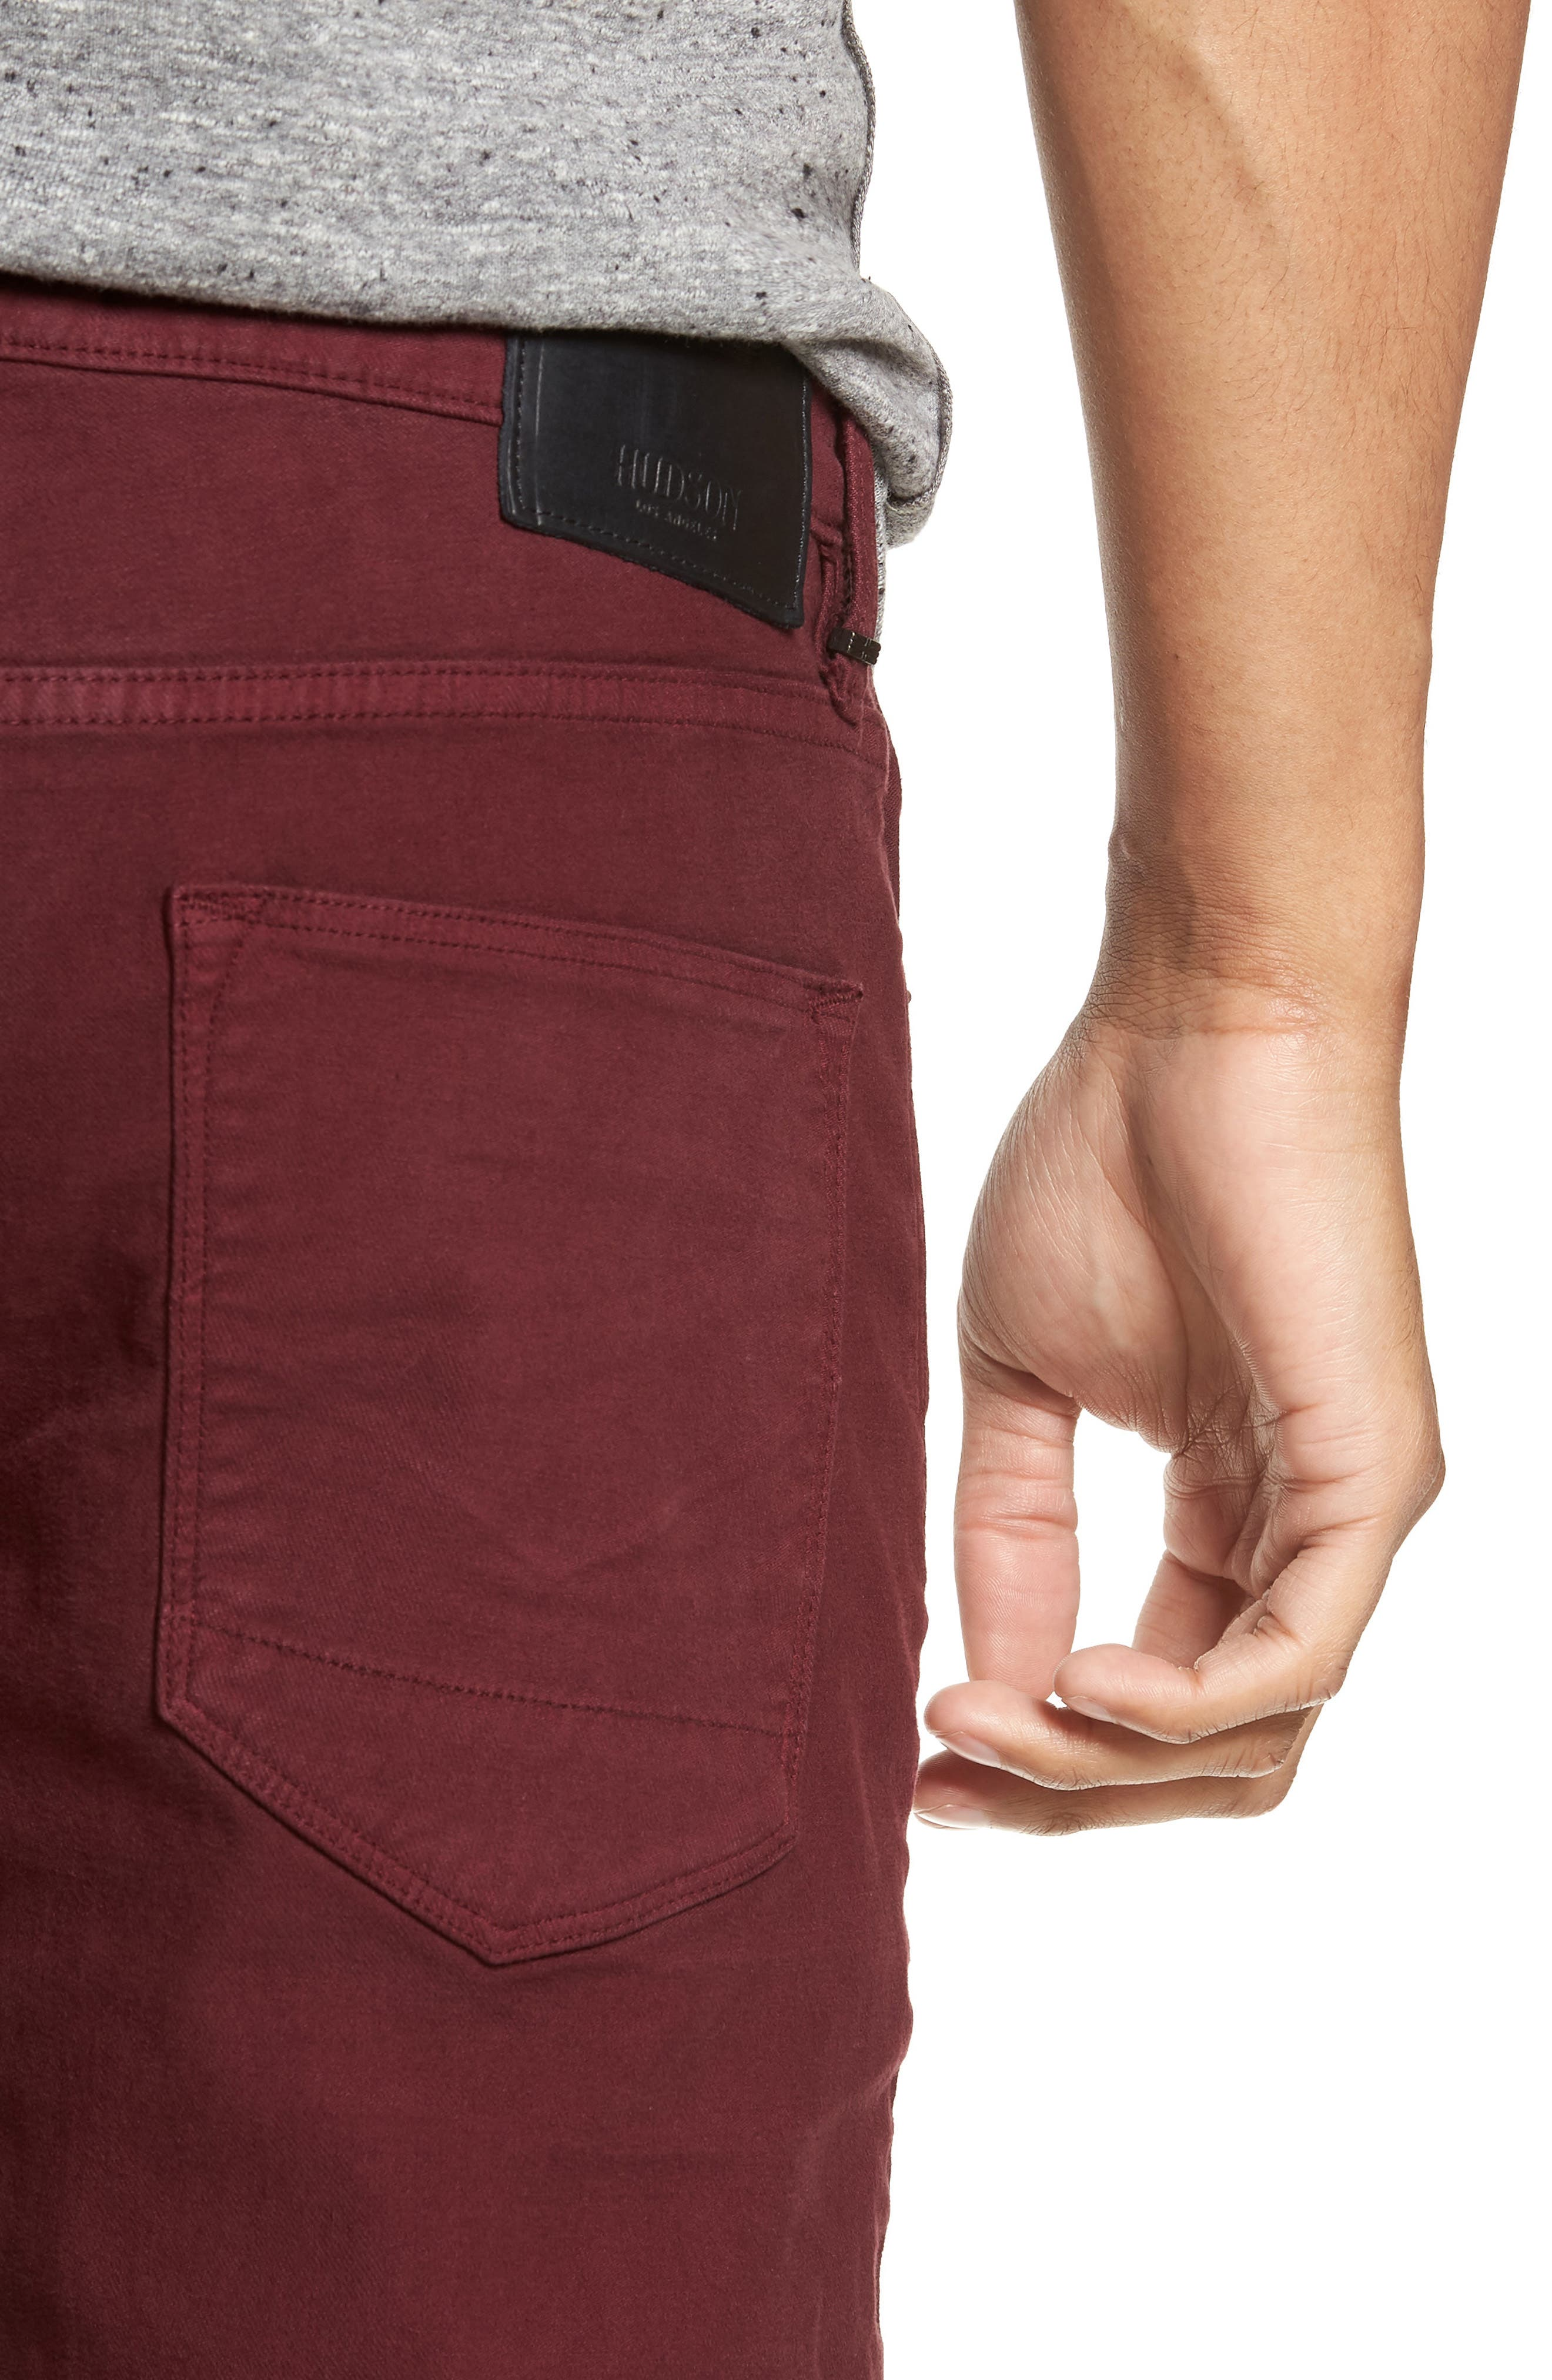 Axl Skinny Fit Twill Jeans,                             Alternate thumbnail 4, color,                             OXBLOOD